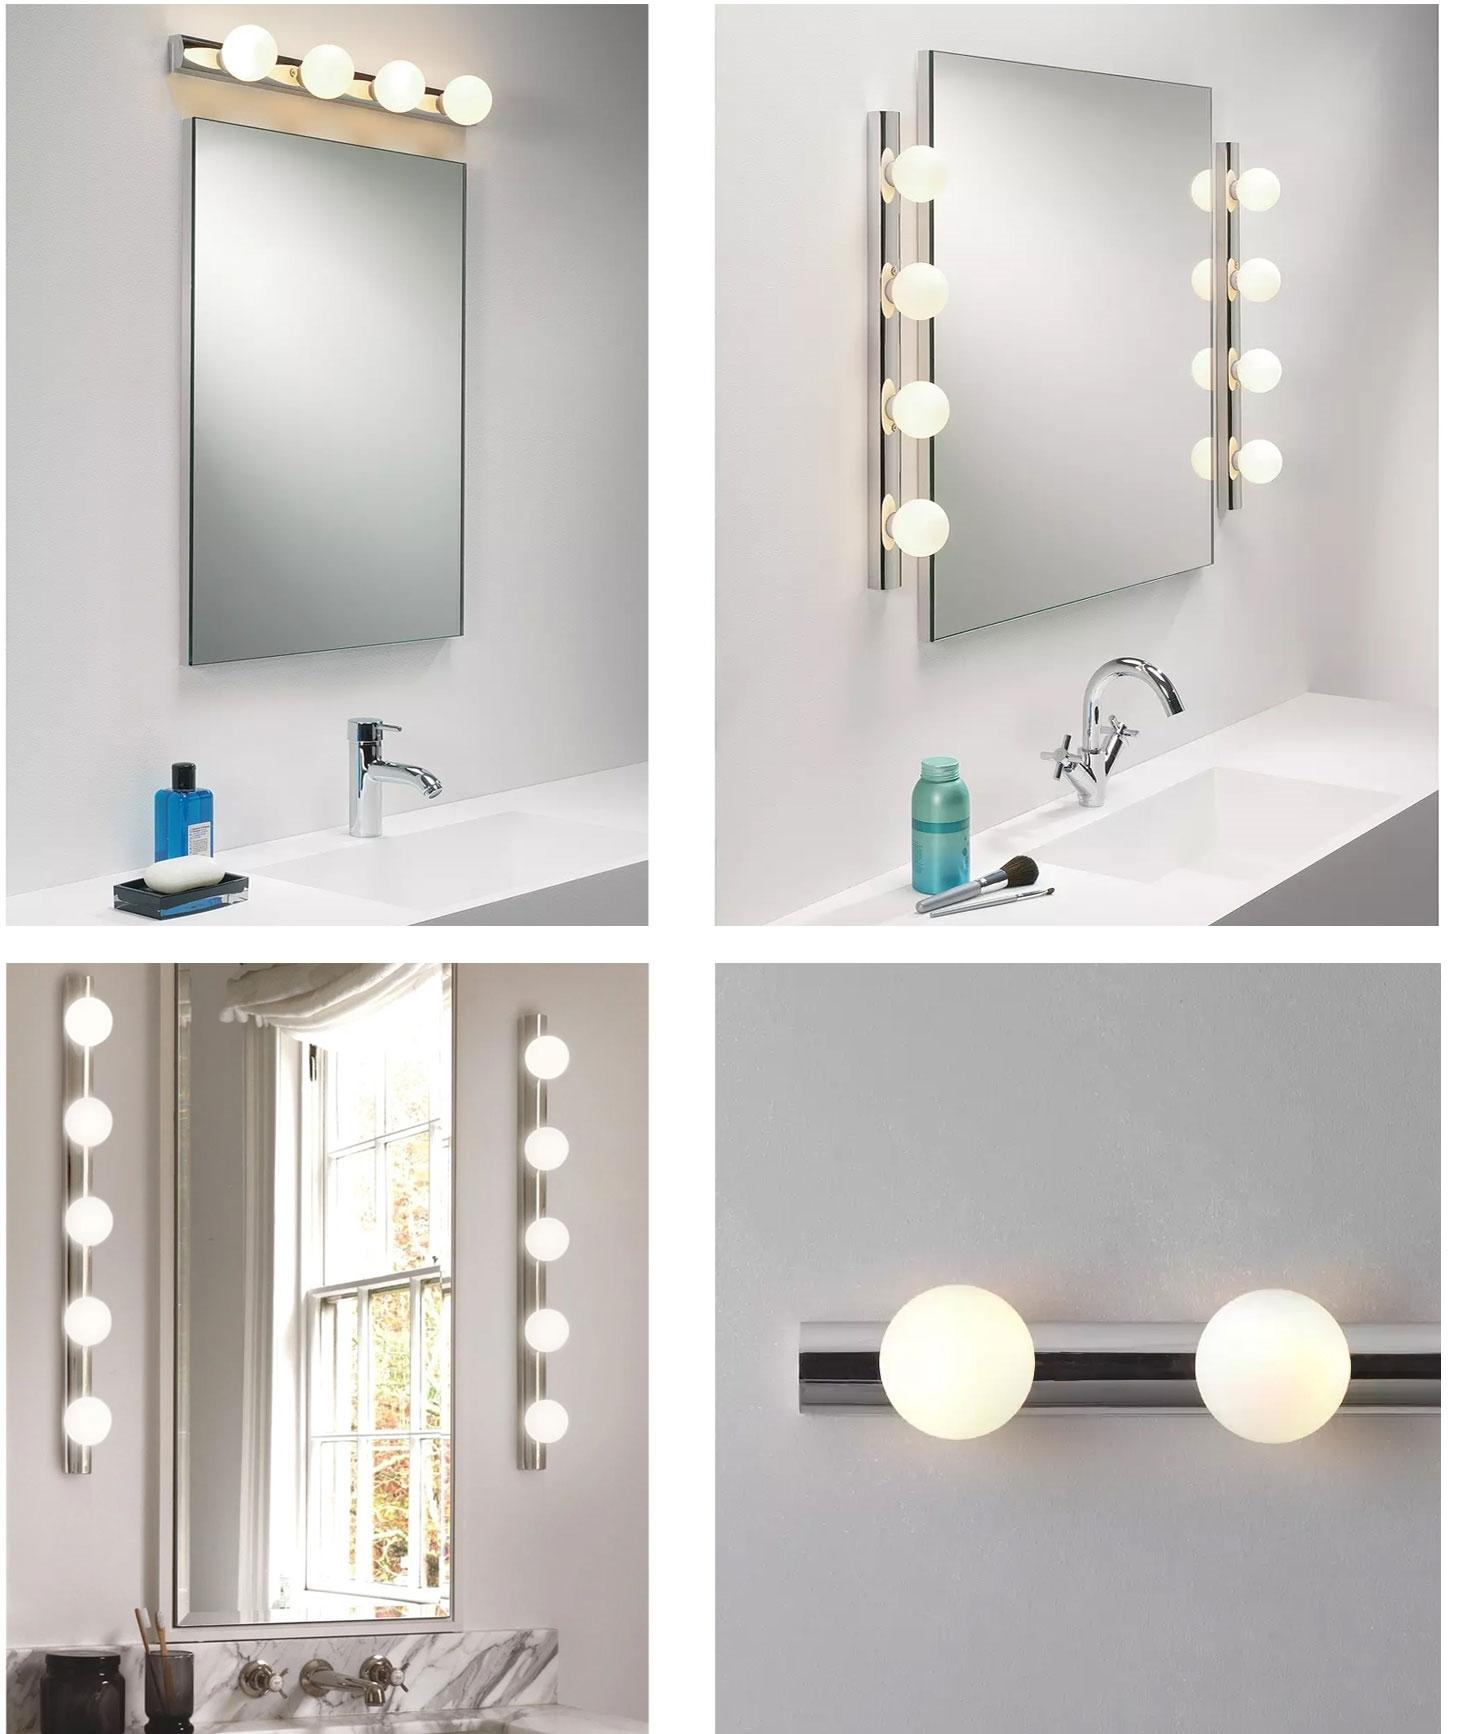 Bathroom Mirror Wall Lights, How To Change Led Bulb In Bathroom Mirror